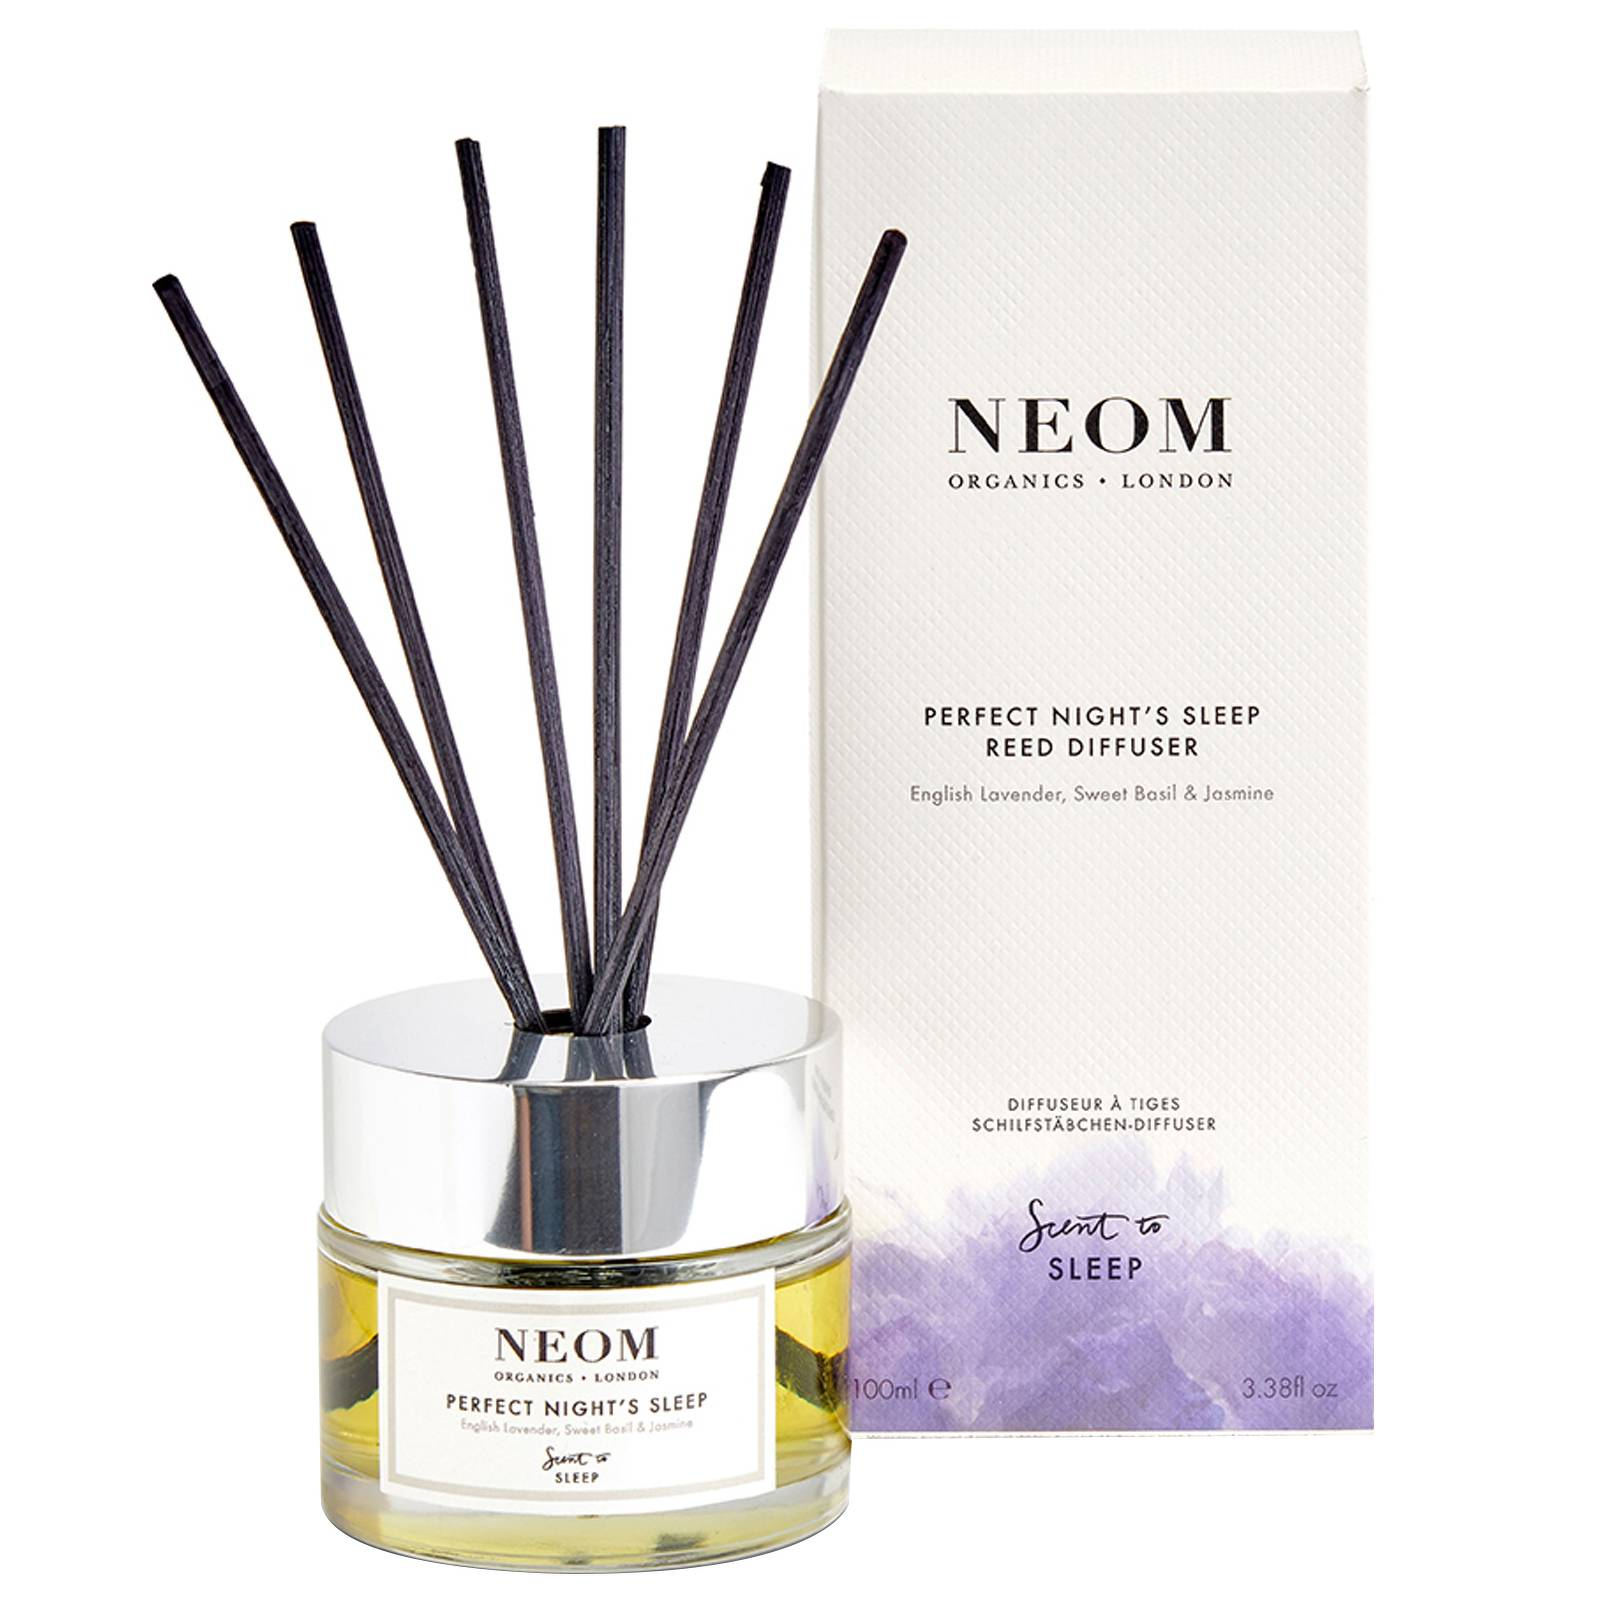 Neom Organics London Scent To Sleep Emanatore di tranquillità 100ml